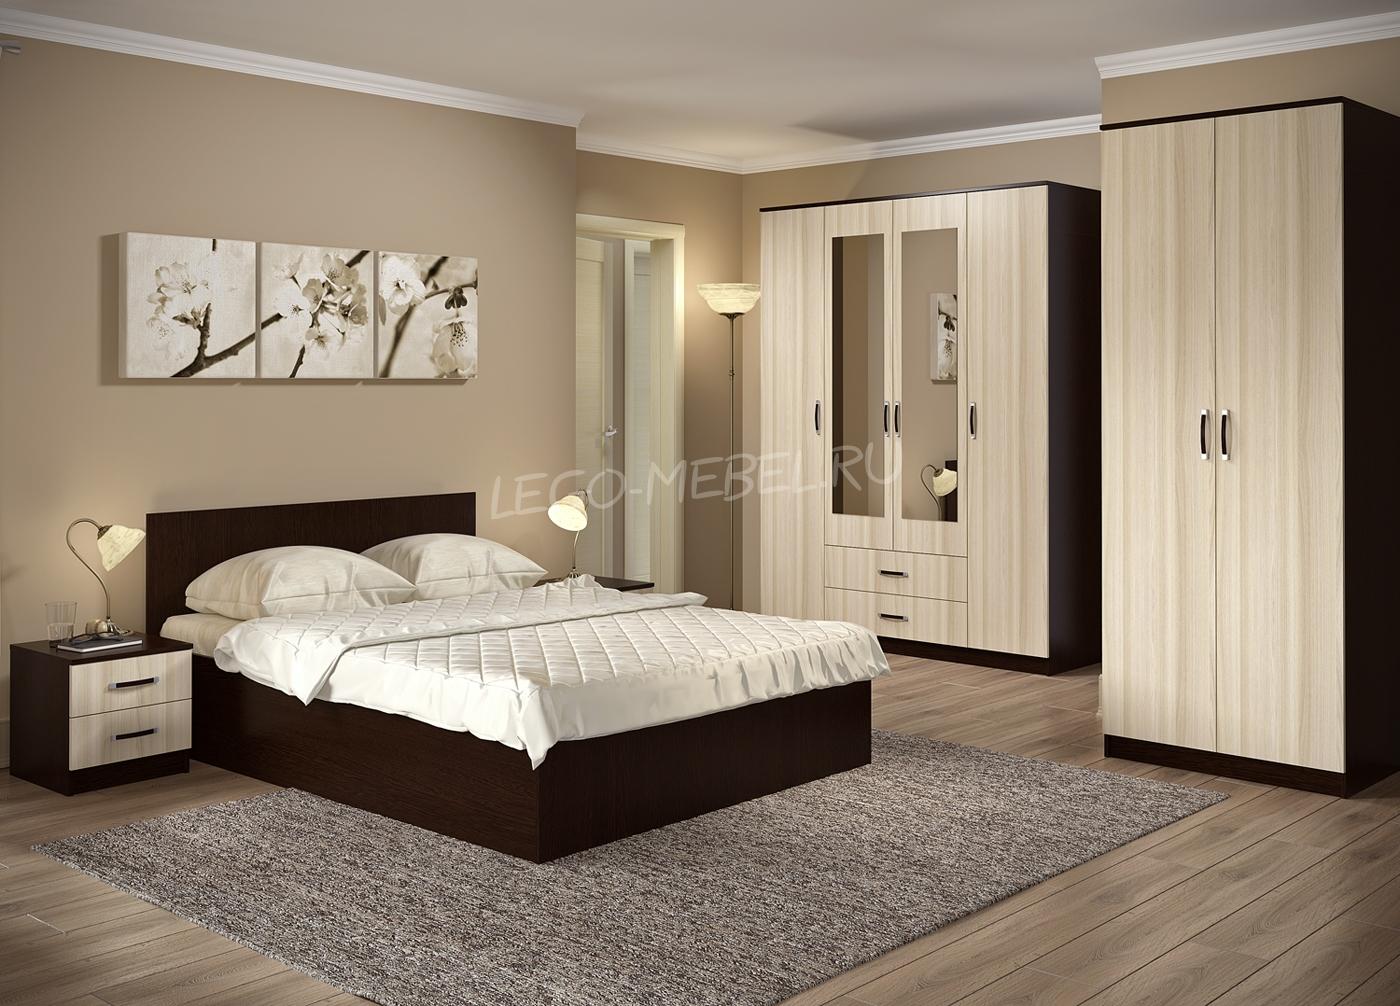 Спальня Ронда 4